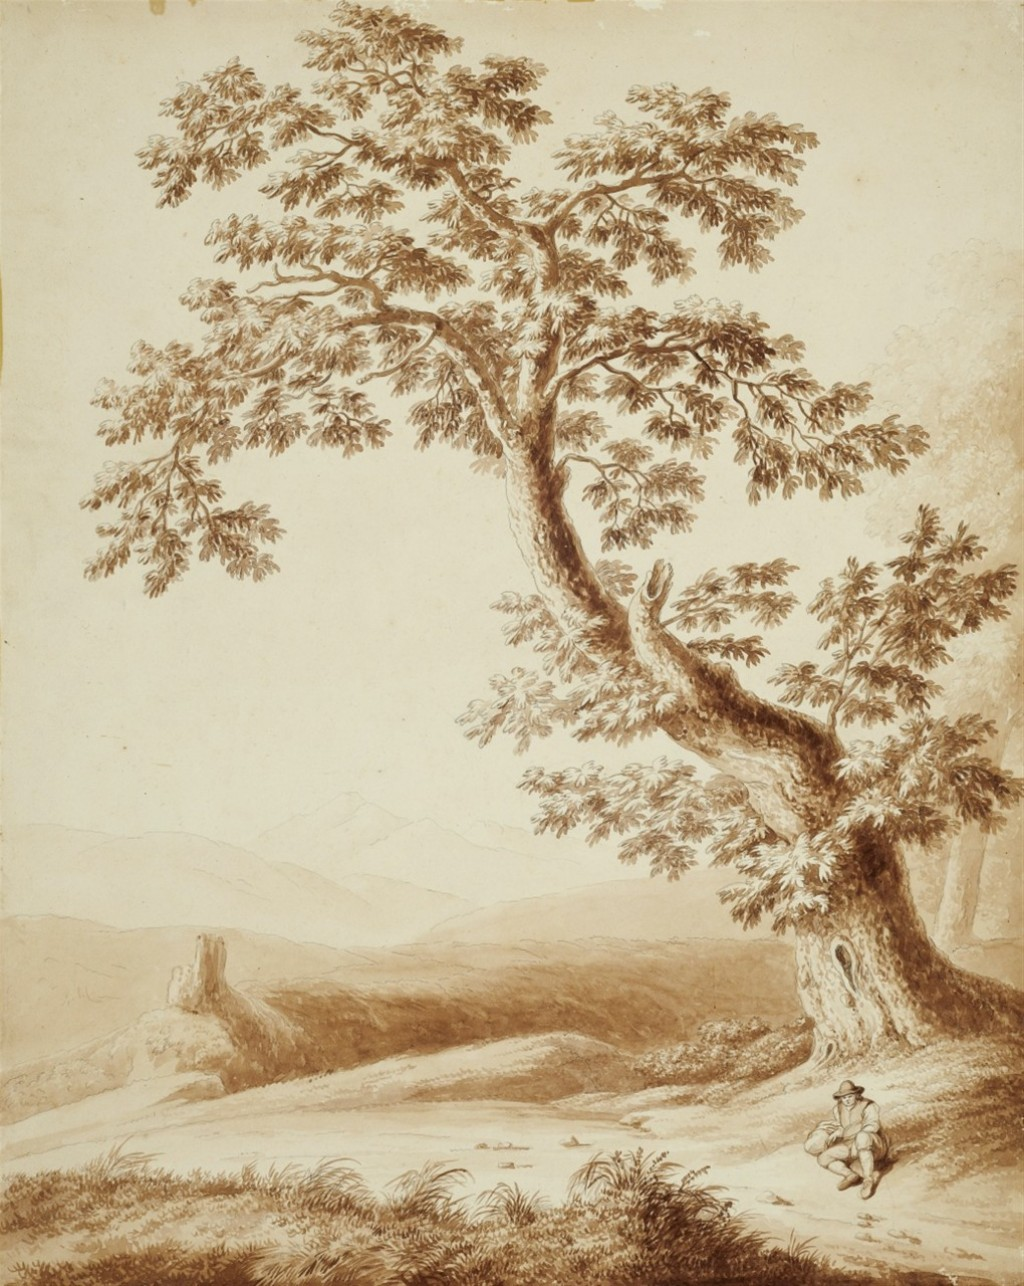 Paesaggio con viandante sotto un grande castagno - Jacob Philipp Hackert